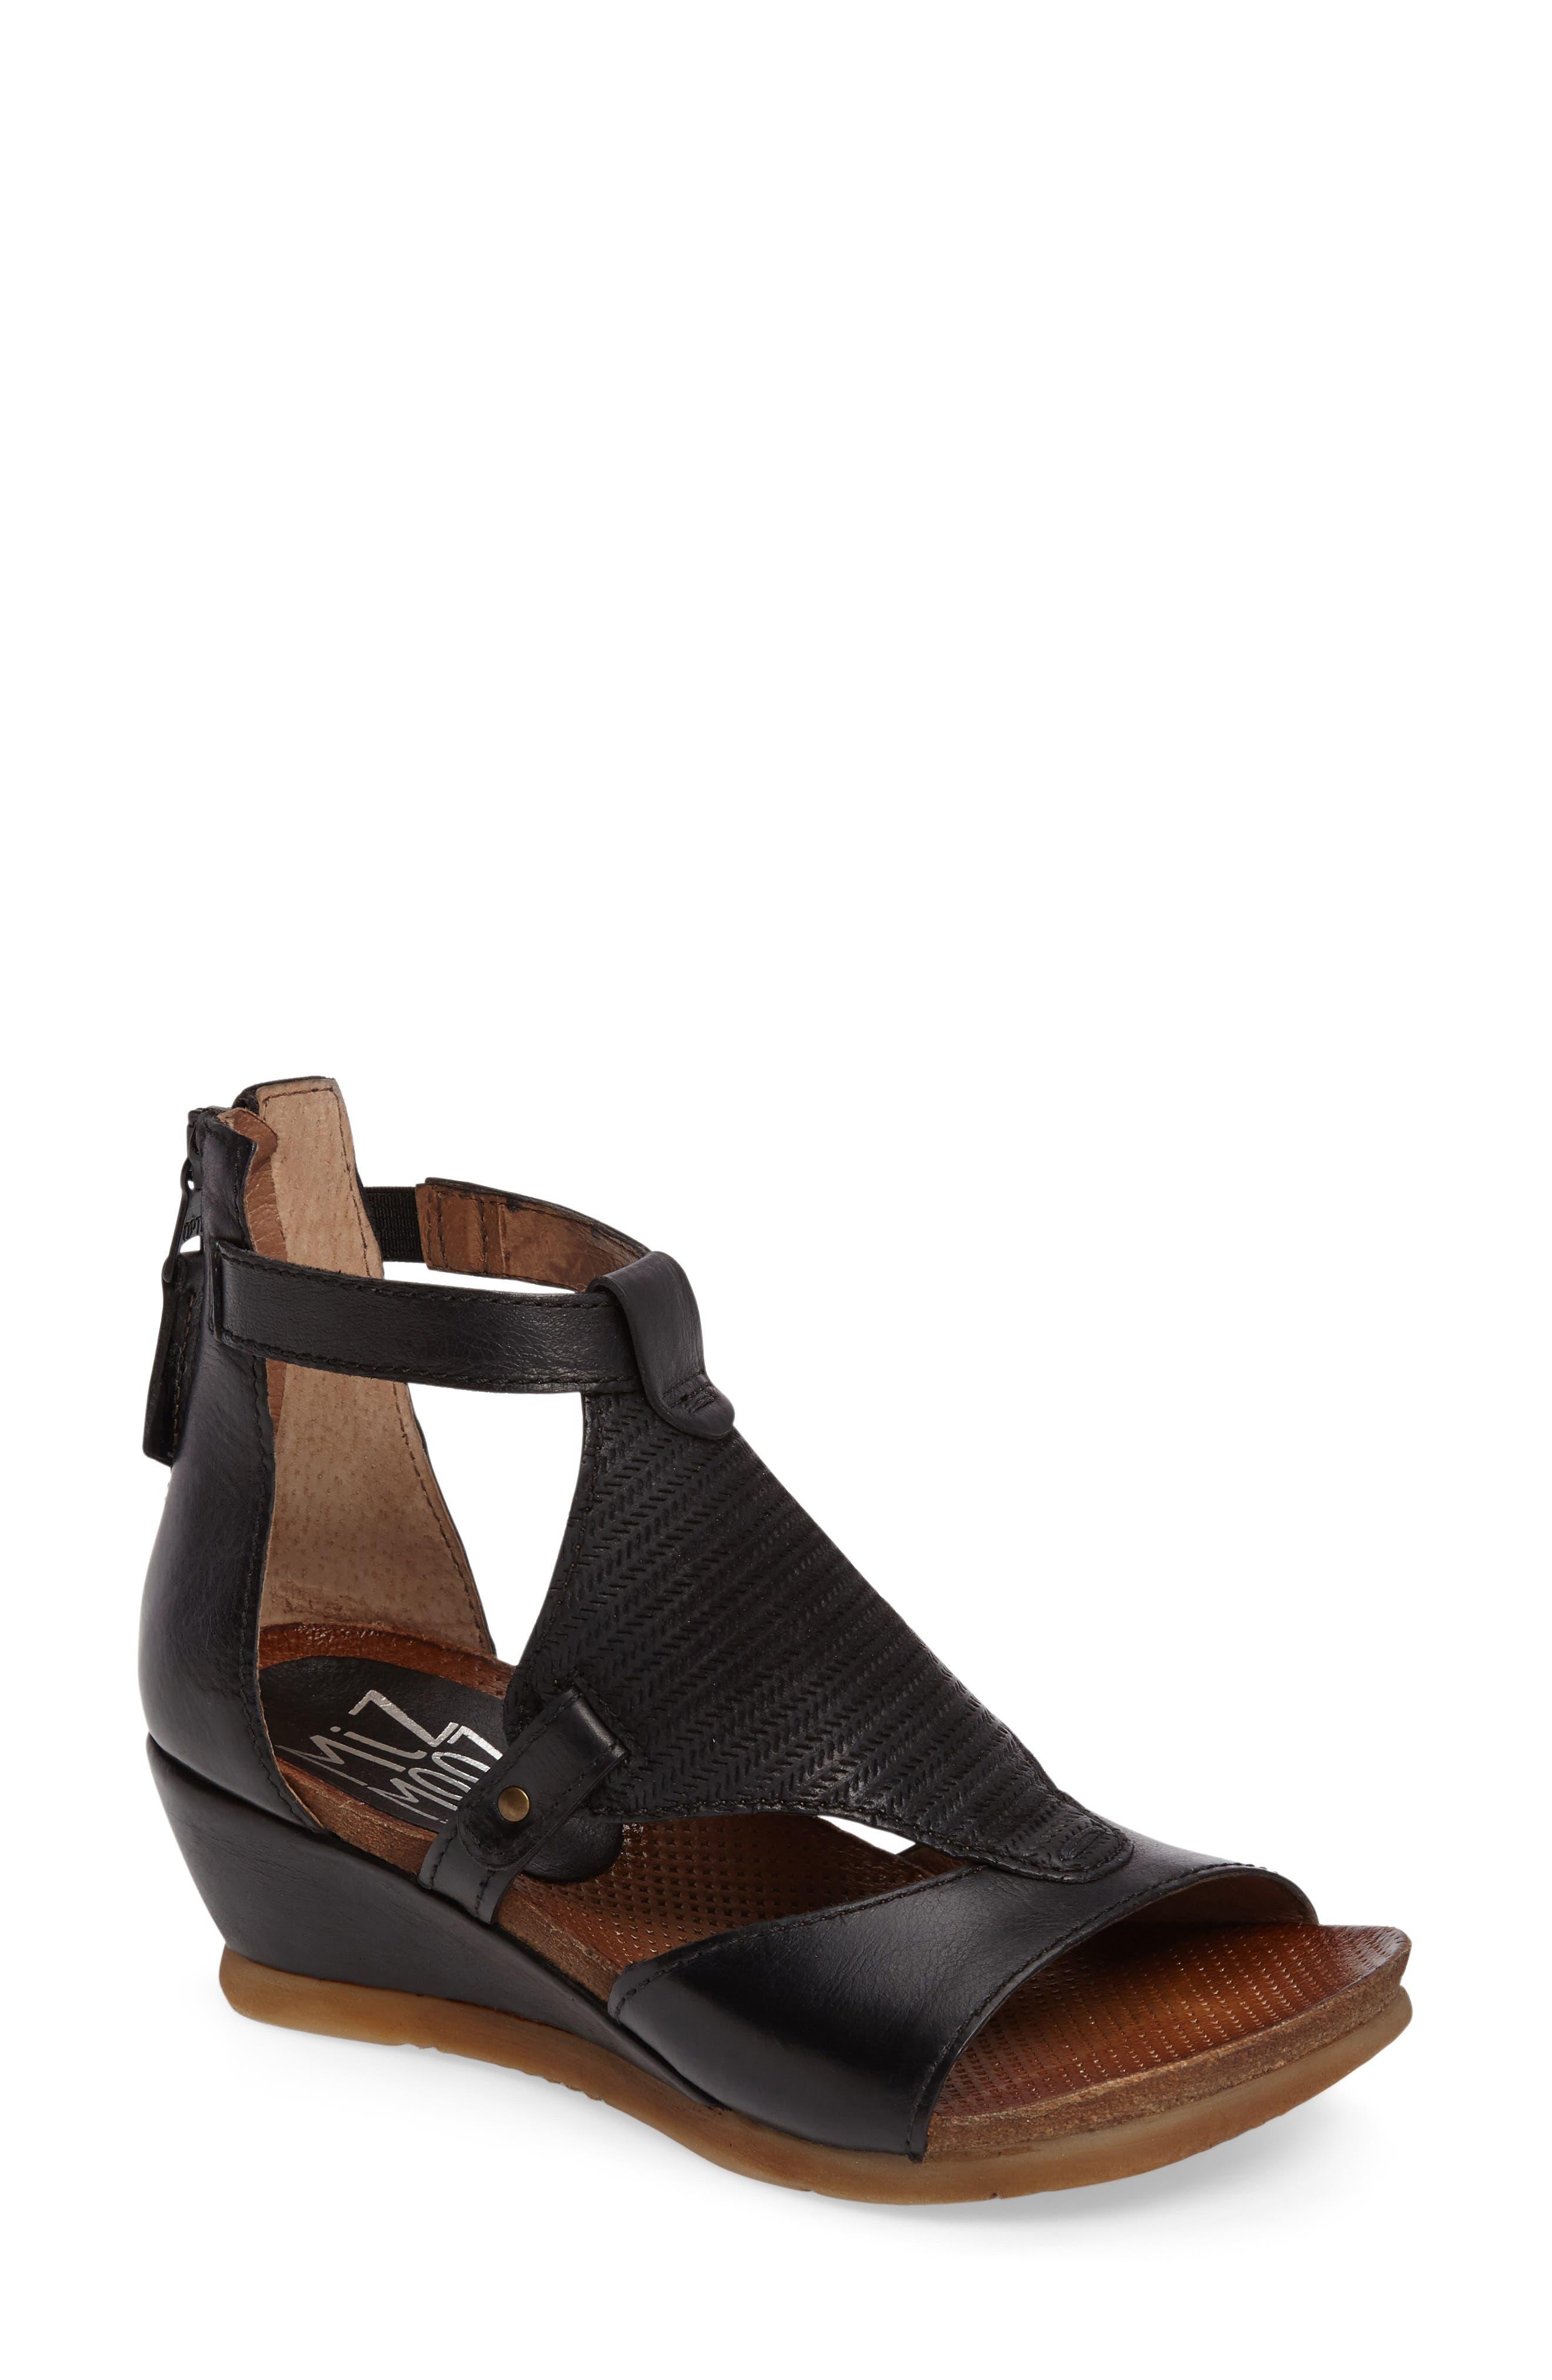 Maisie Wedge Sandal,                         Main,                         color, 001